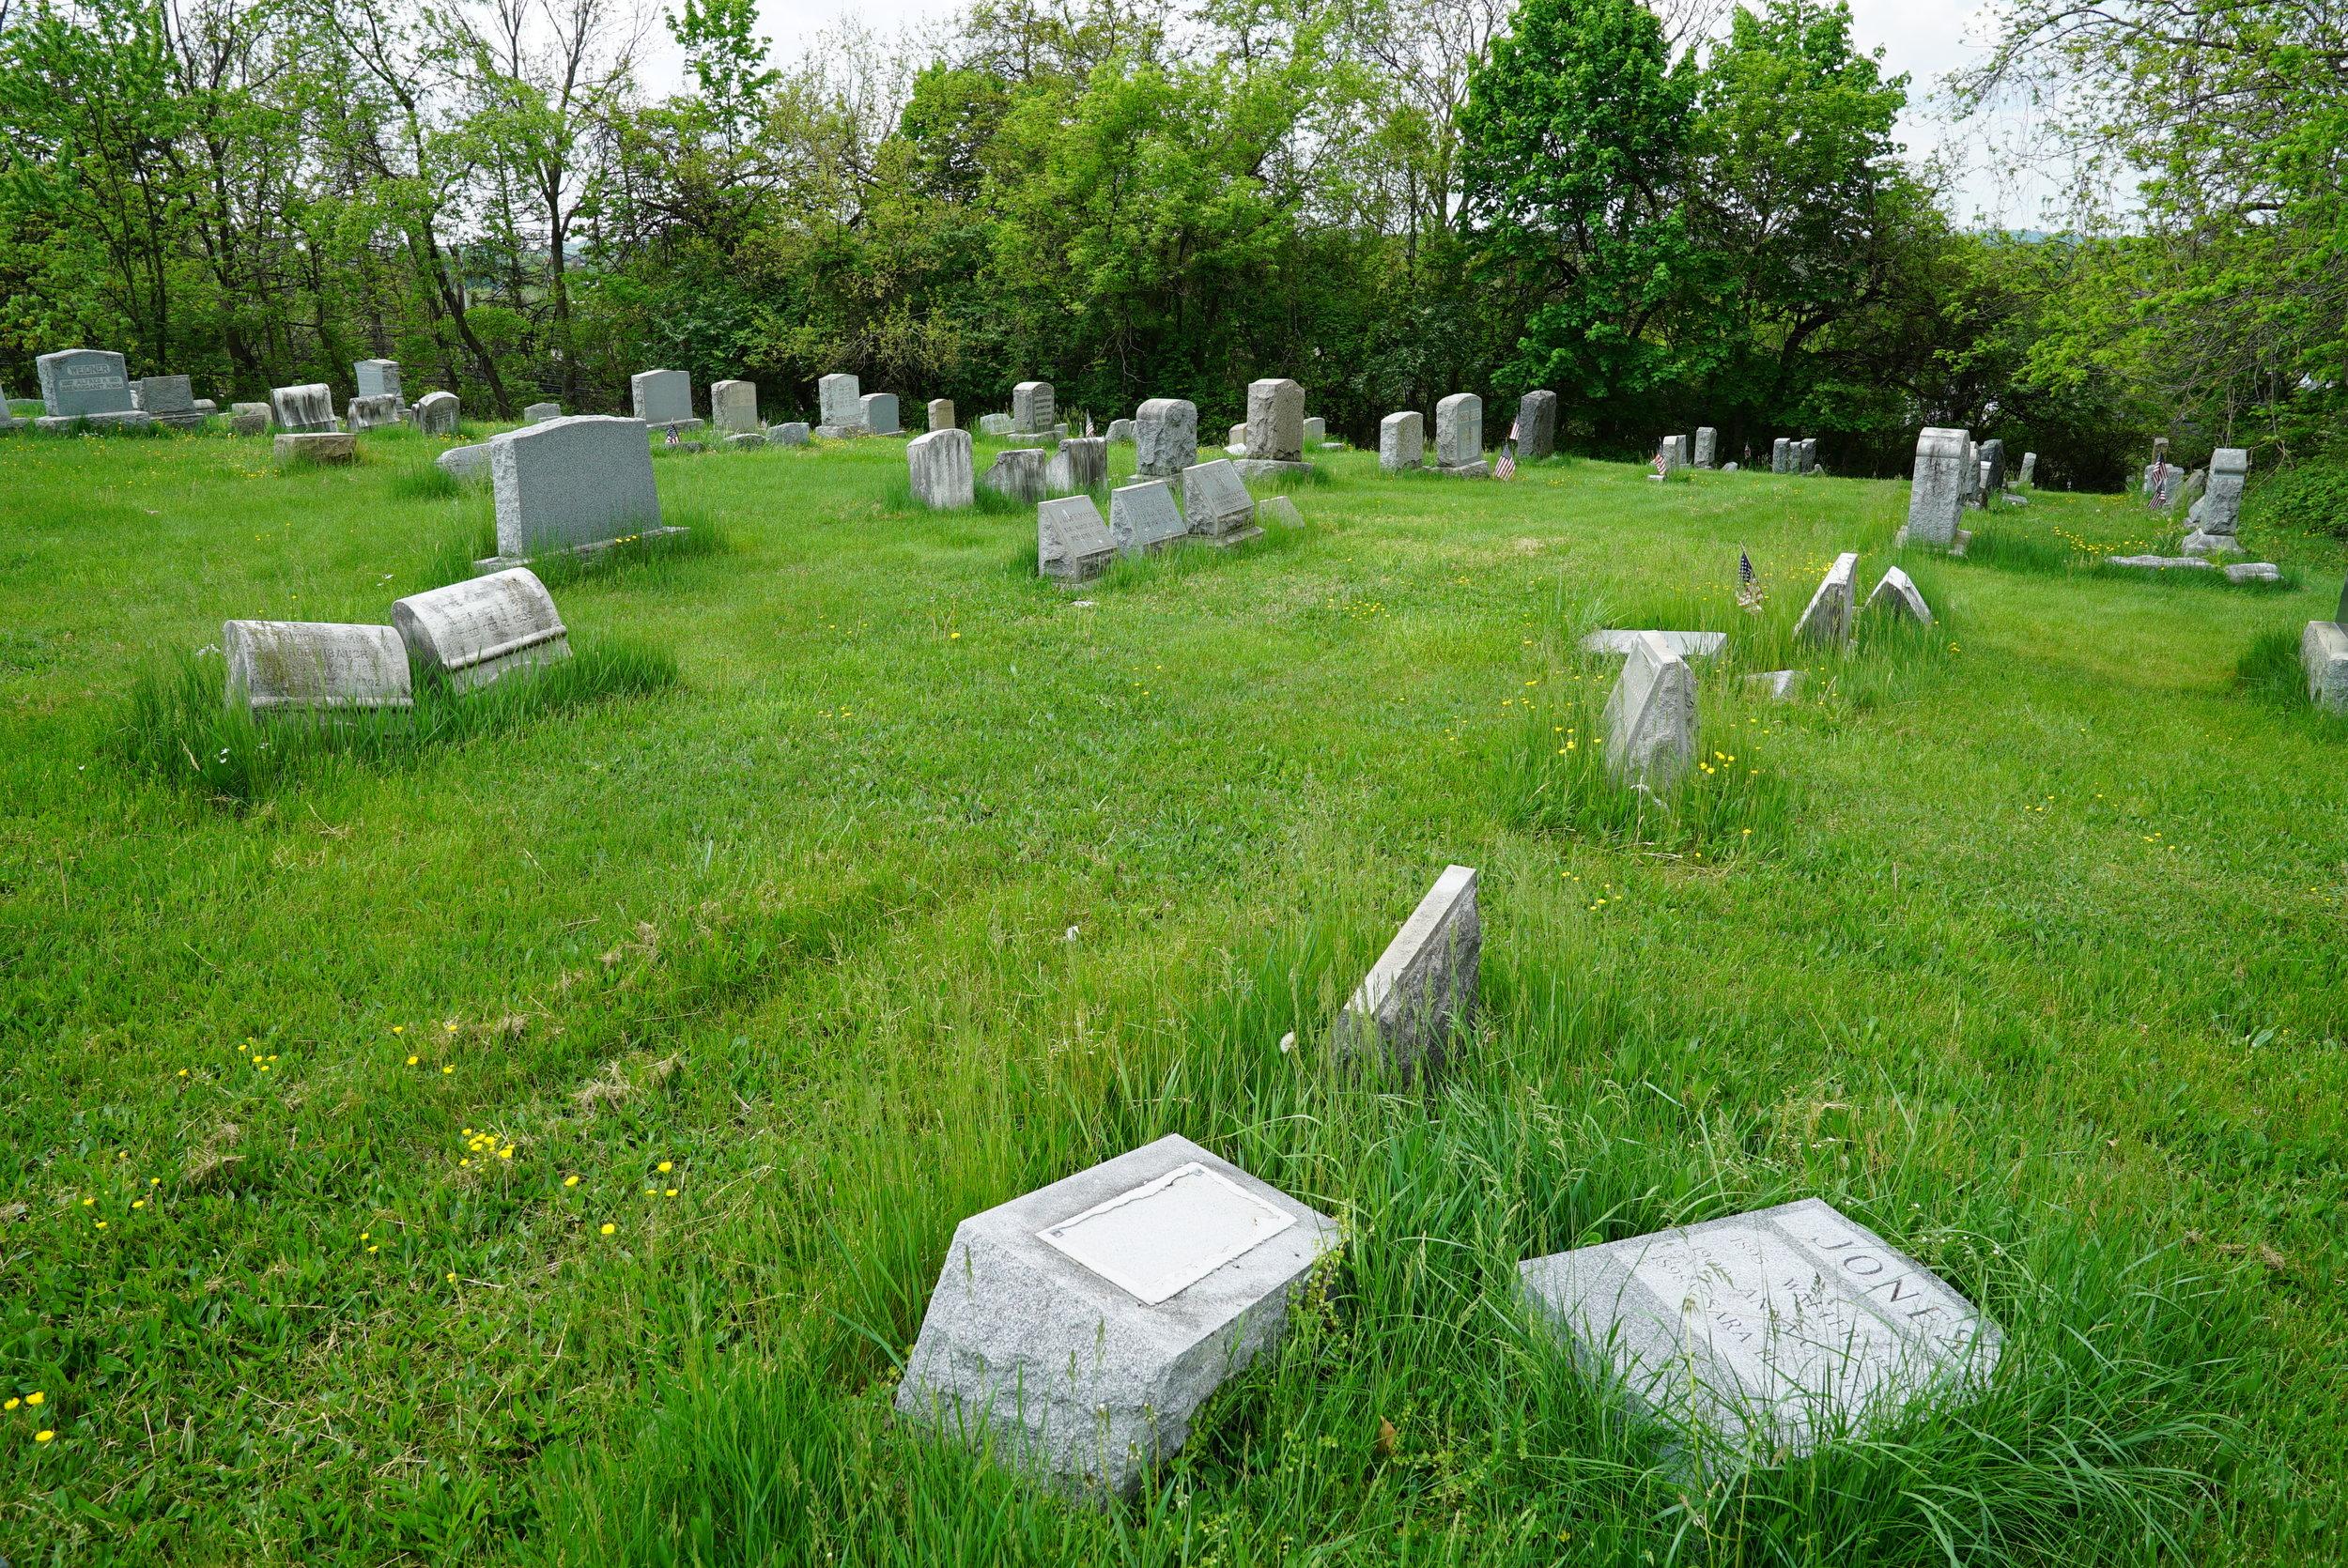 Cold Point Baptist Church Cemetery - Plymouth Meeting, Pennsylvania.